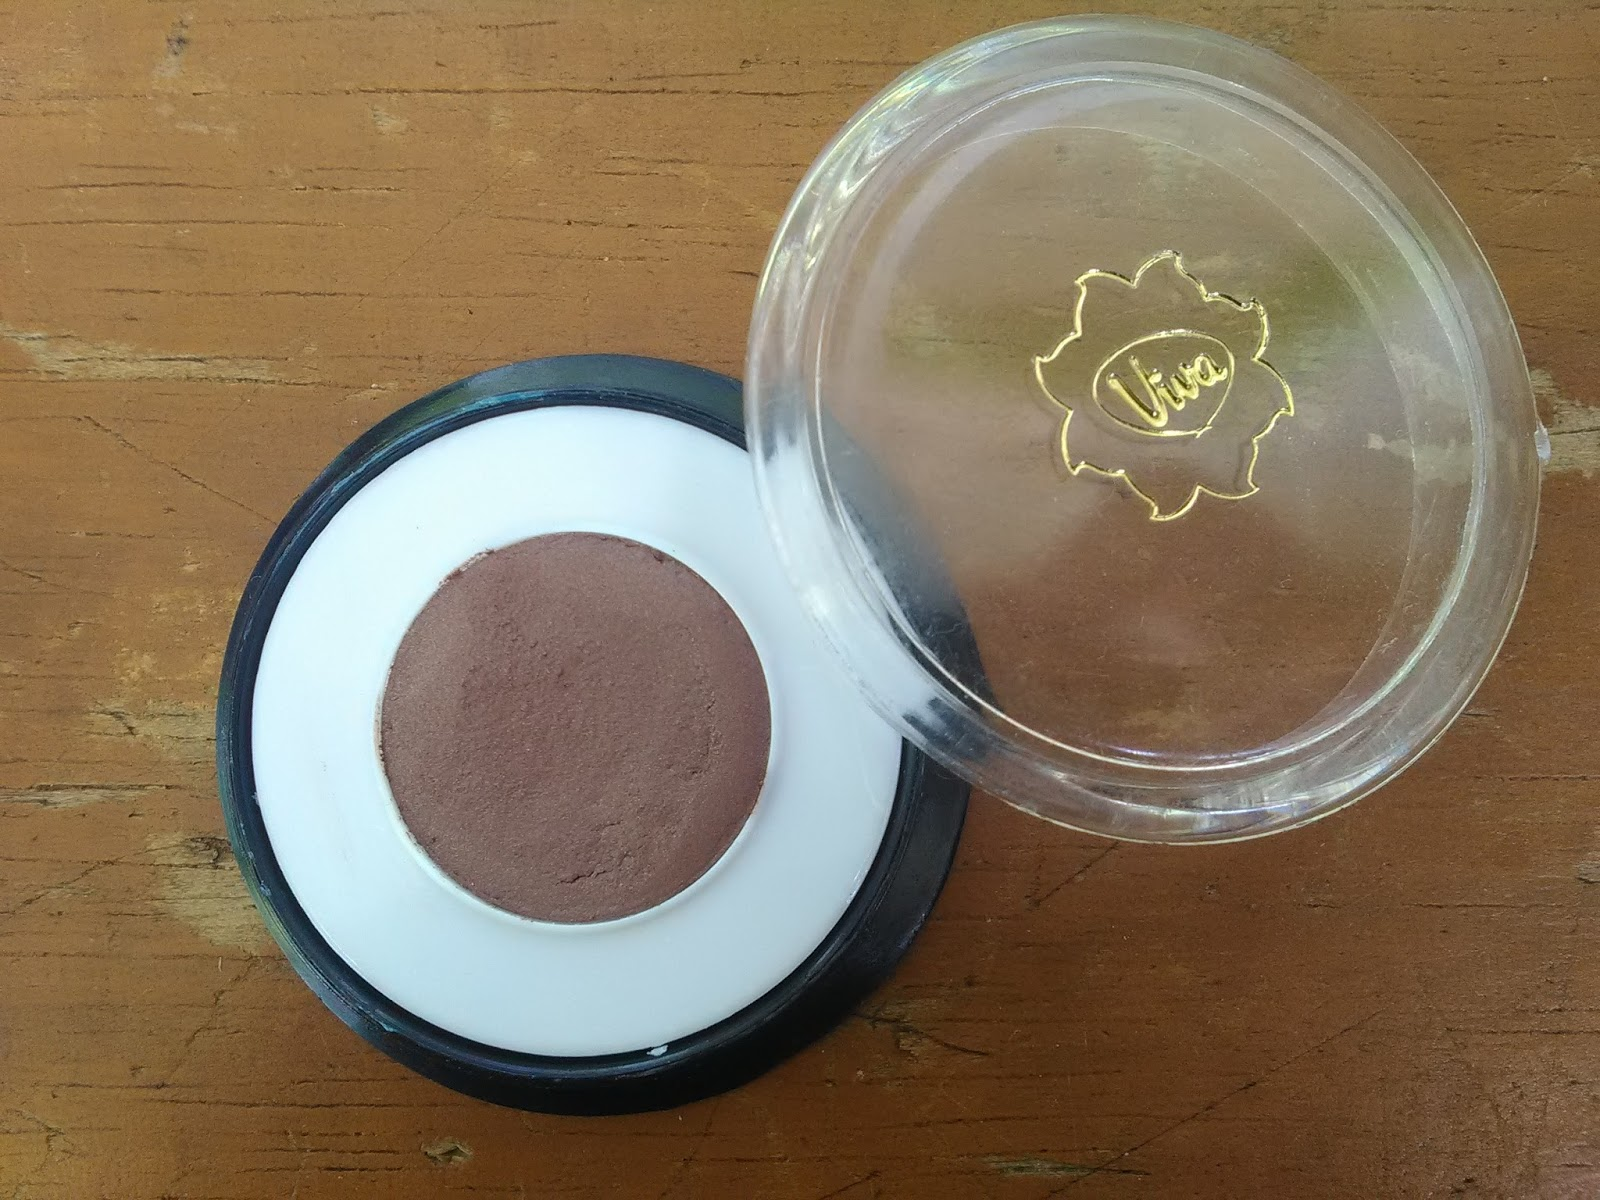 Review Eye Shadow Cream Viva